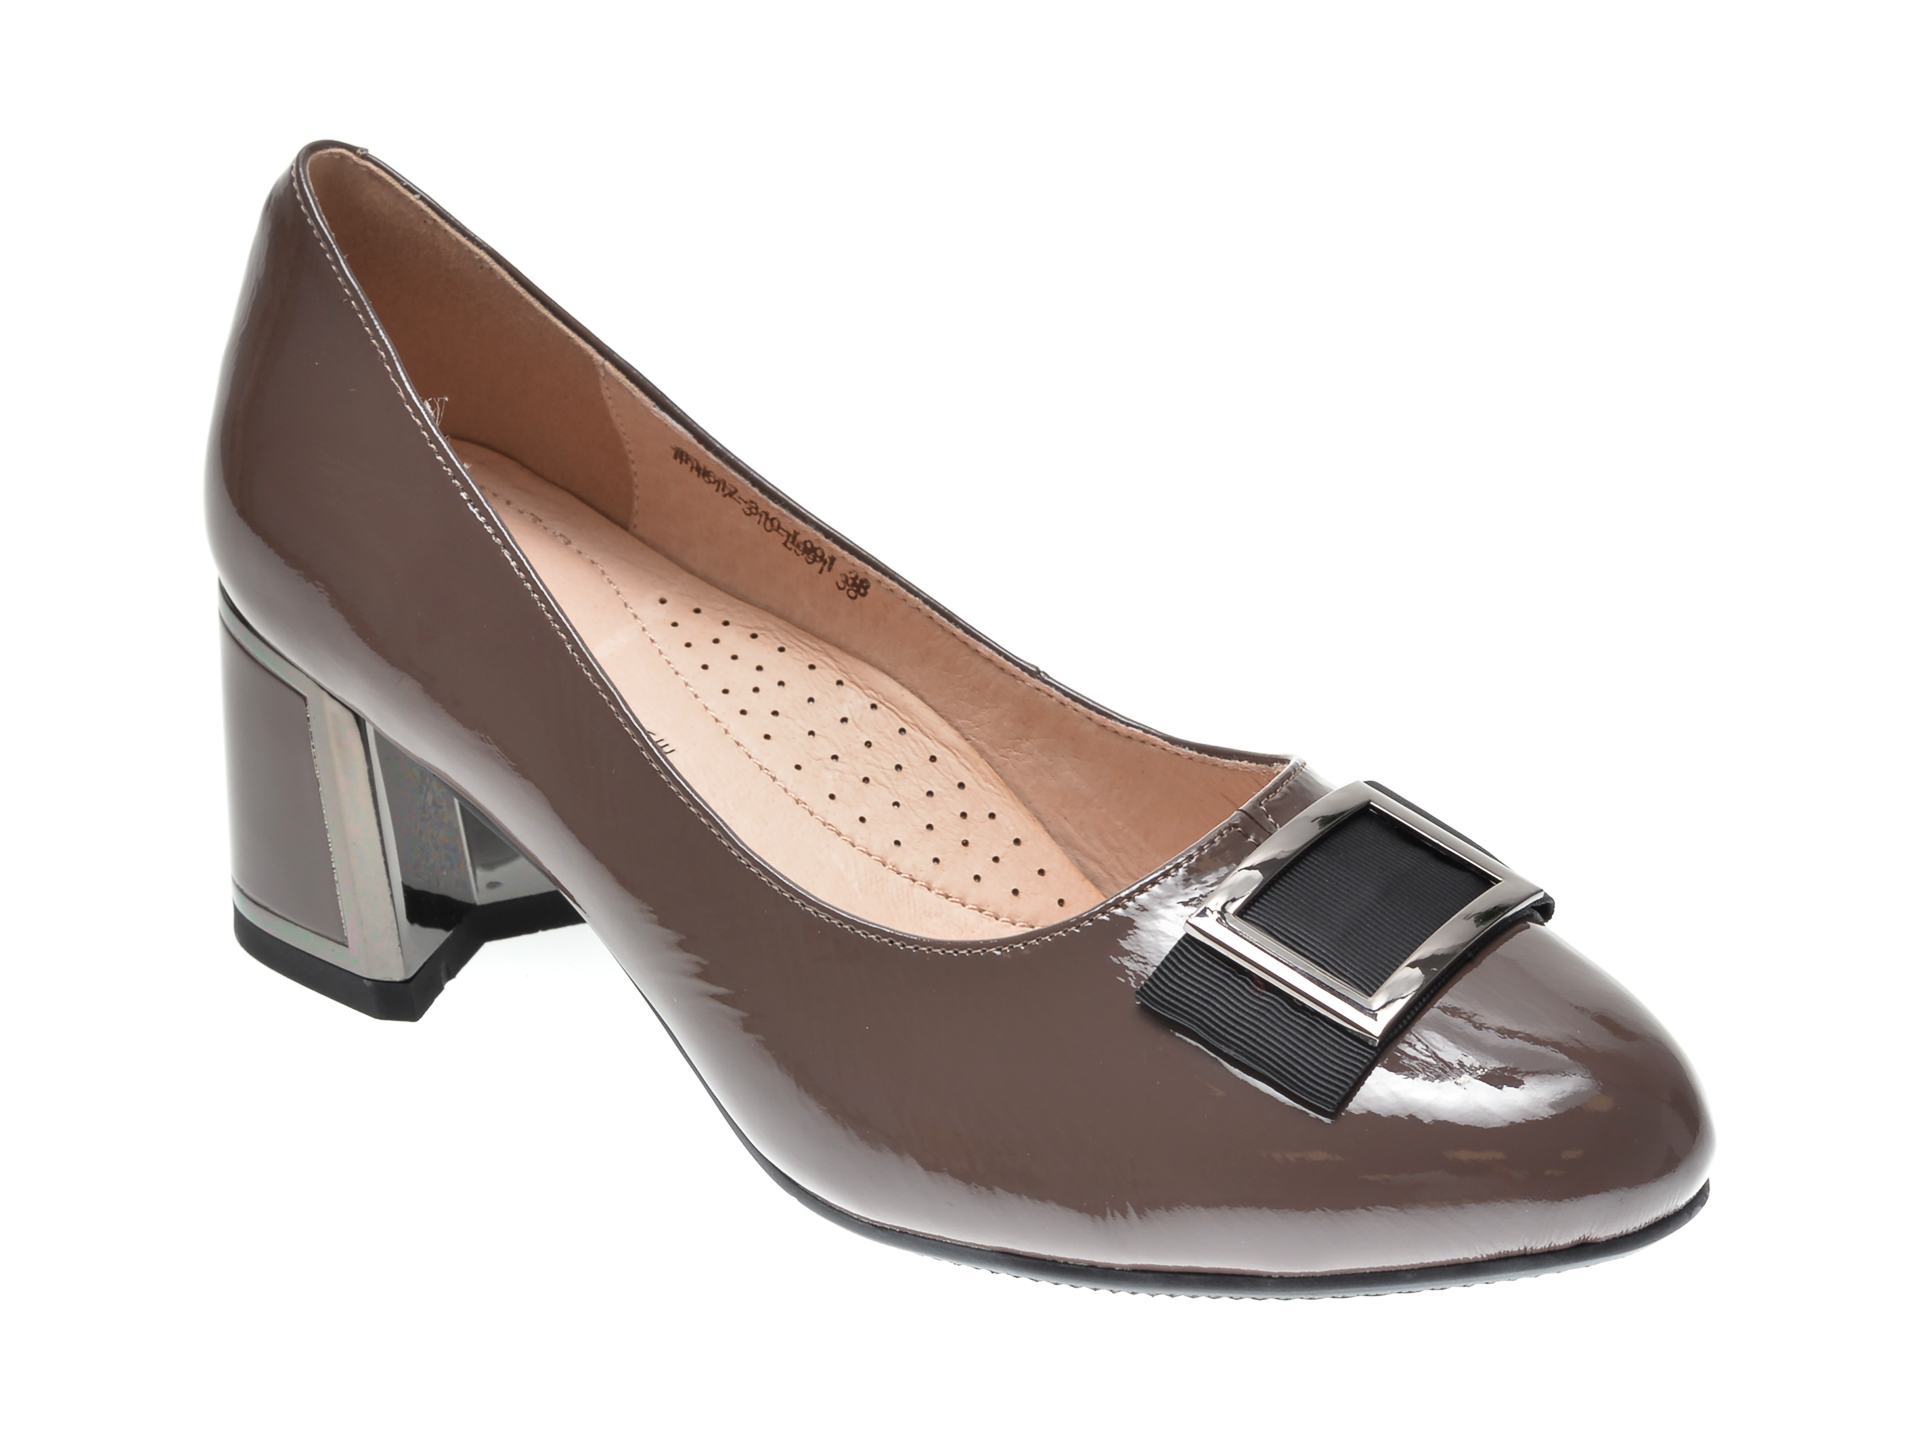 Pantofi KARISMA gri, 1FH6310, din piele naturala lacuita New